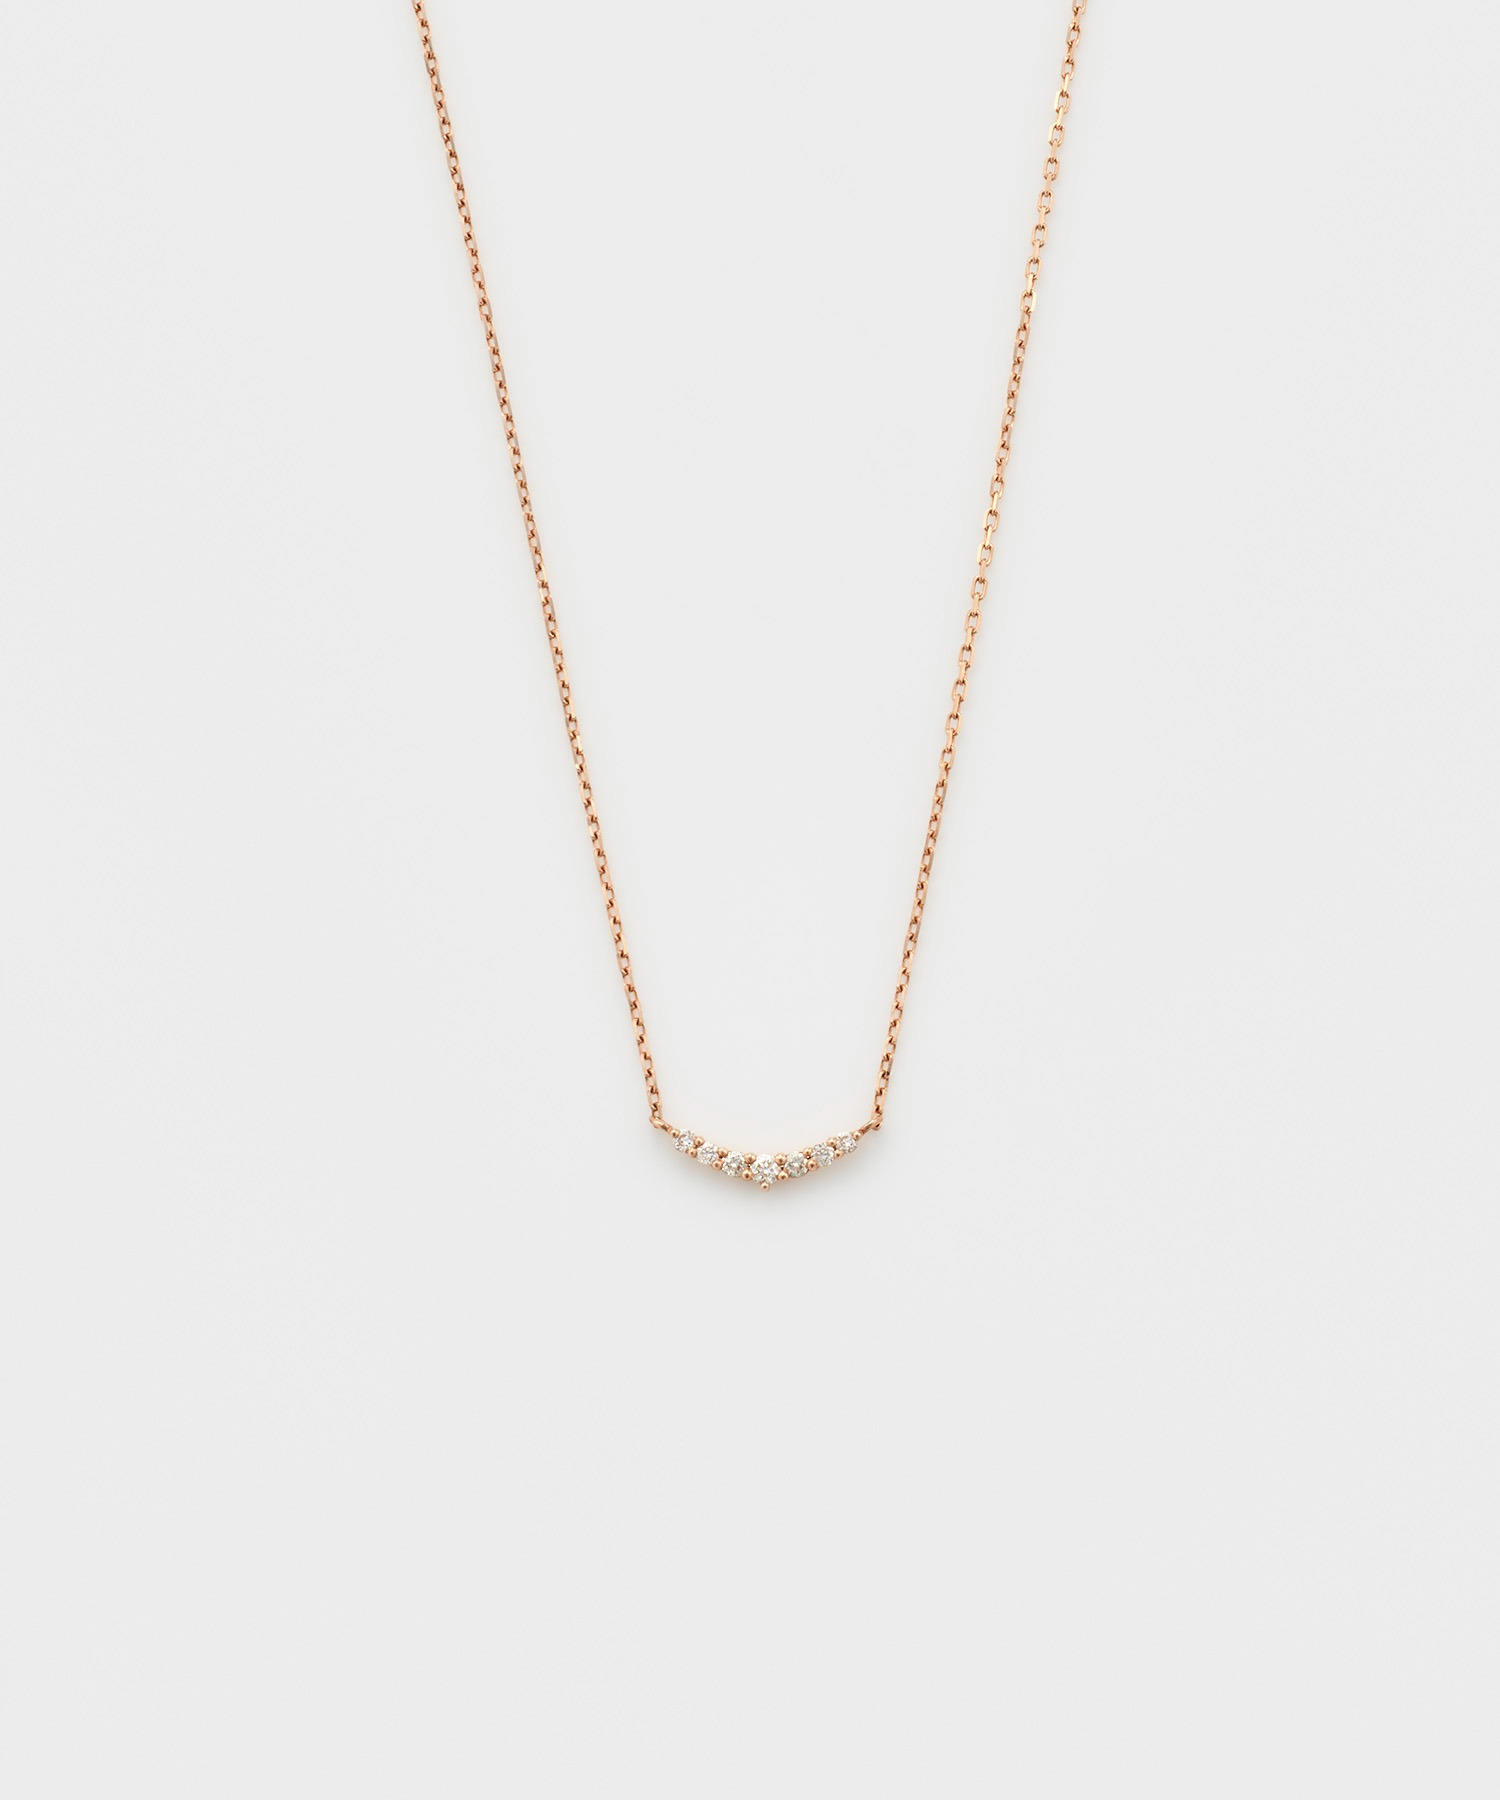 【WEB限定】K10ピンクゴールドネックレス